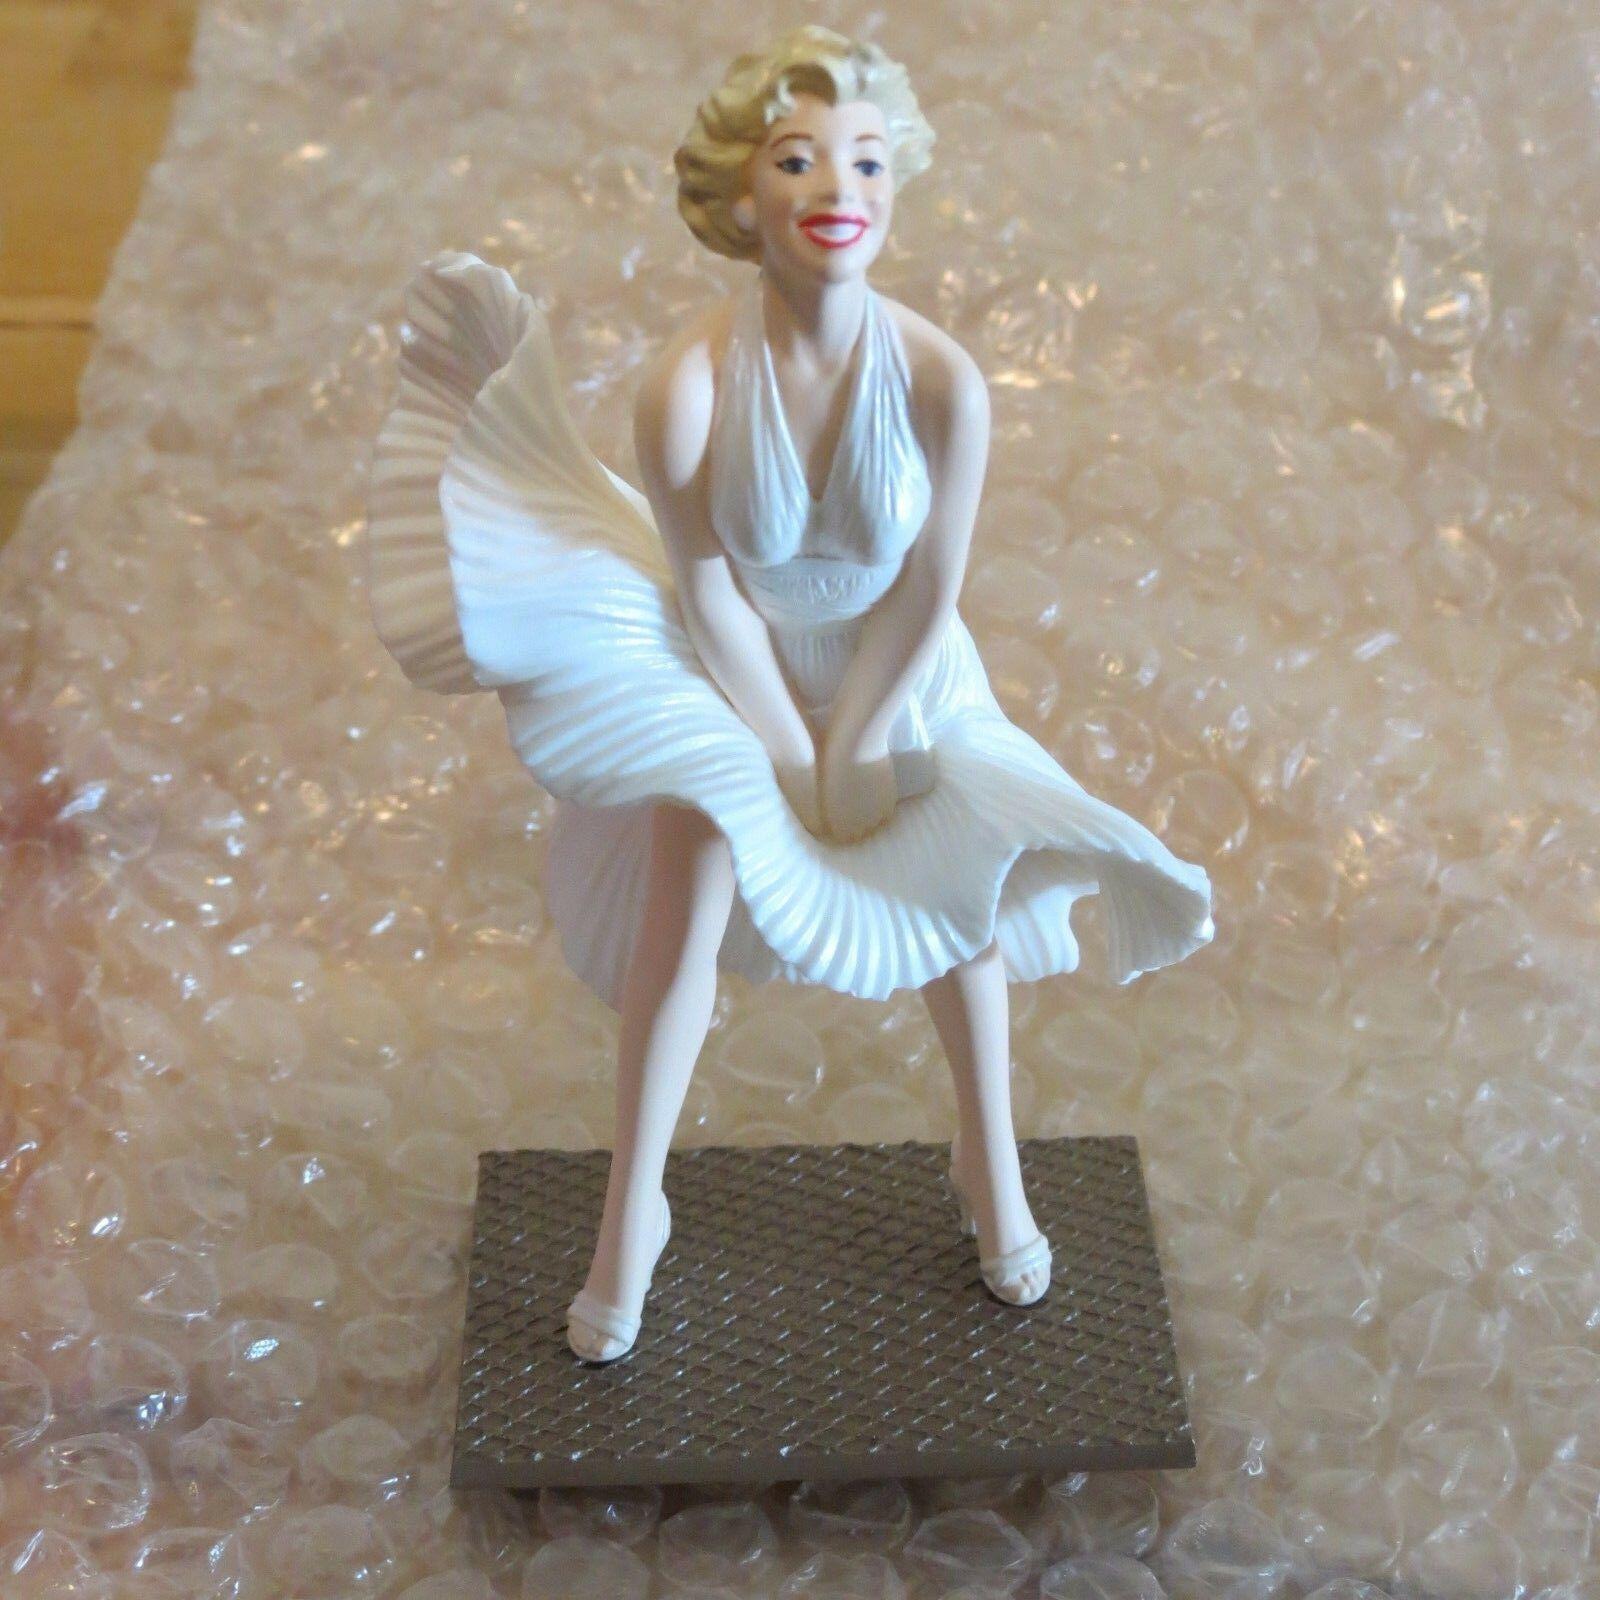 Marilyn Monroe Hallmark Keepsake Ornament 1998  in original box Seven Year Itch image 9